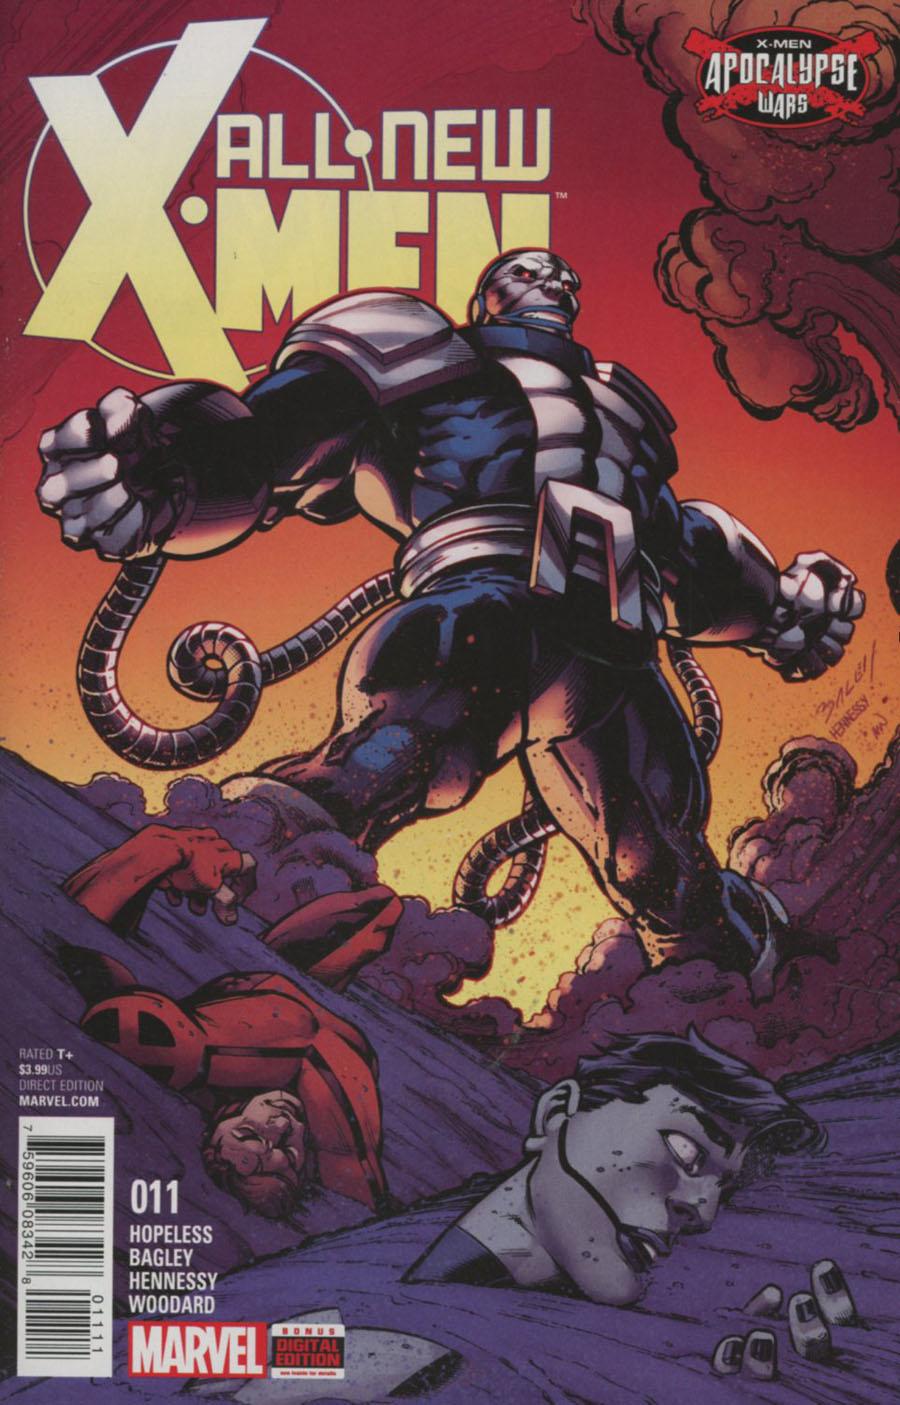 All-New X-Men Vol 2 #11 Cover A Regular Mark Bagley Cover (X-Men Apocalypse Wars Tie-In)